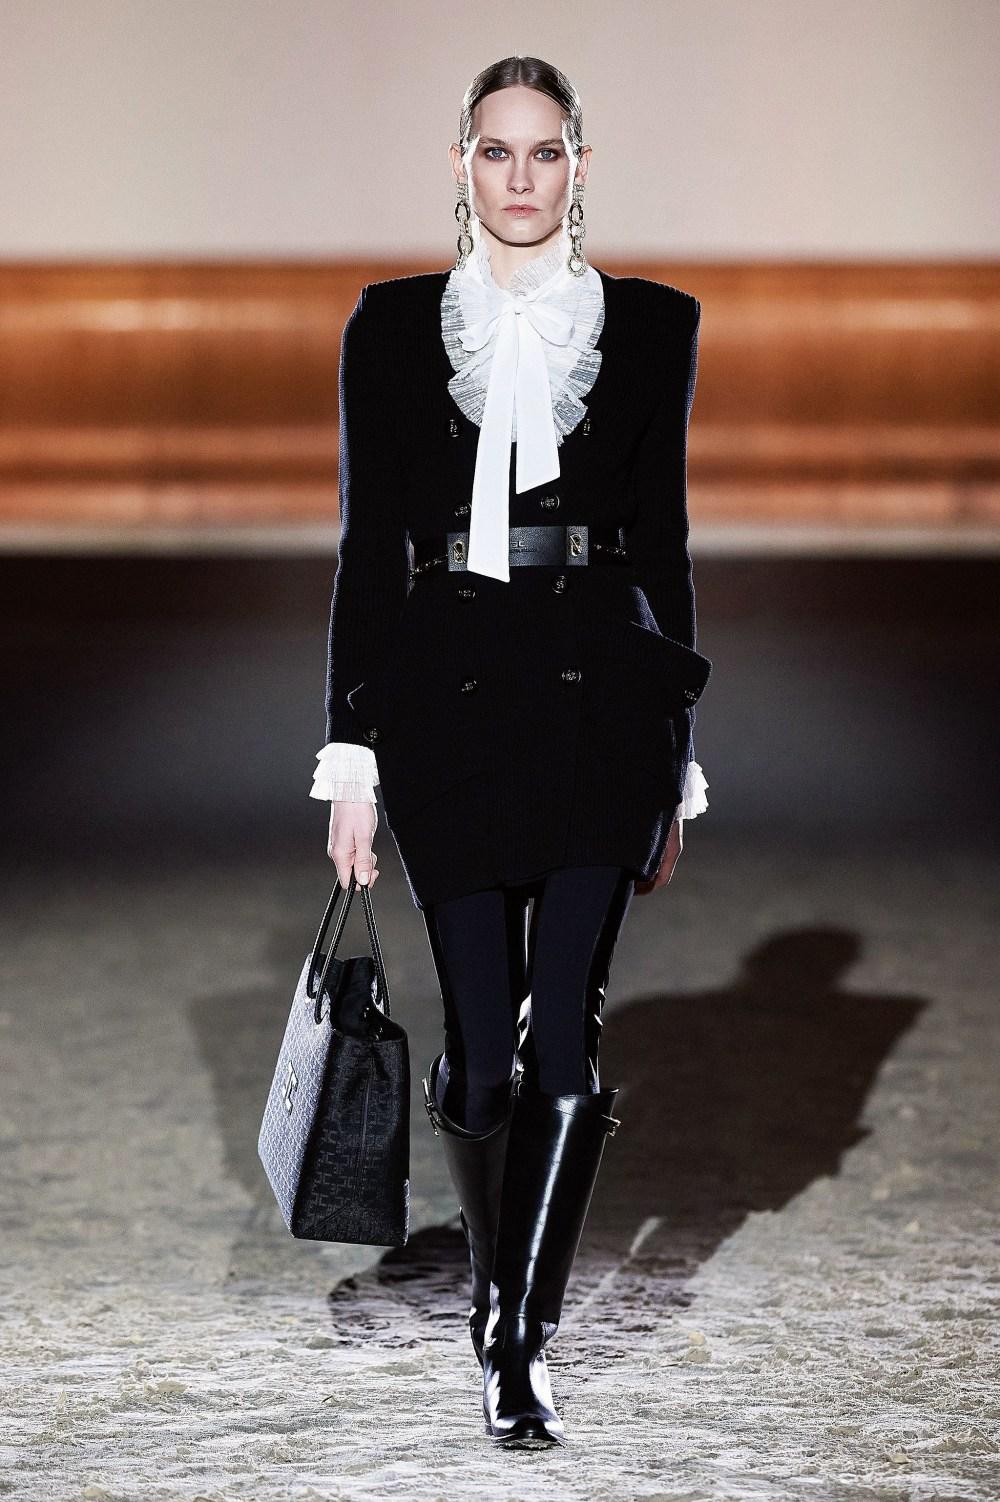 Elisabetta Franchi: Elisabetta Franchi Fall Winter 2021-22 Fashion Show Photo #41